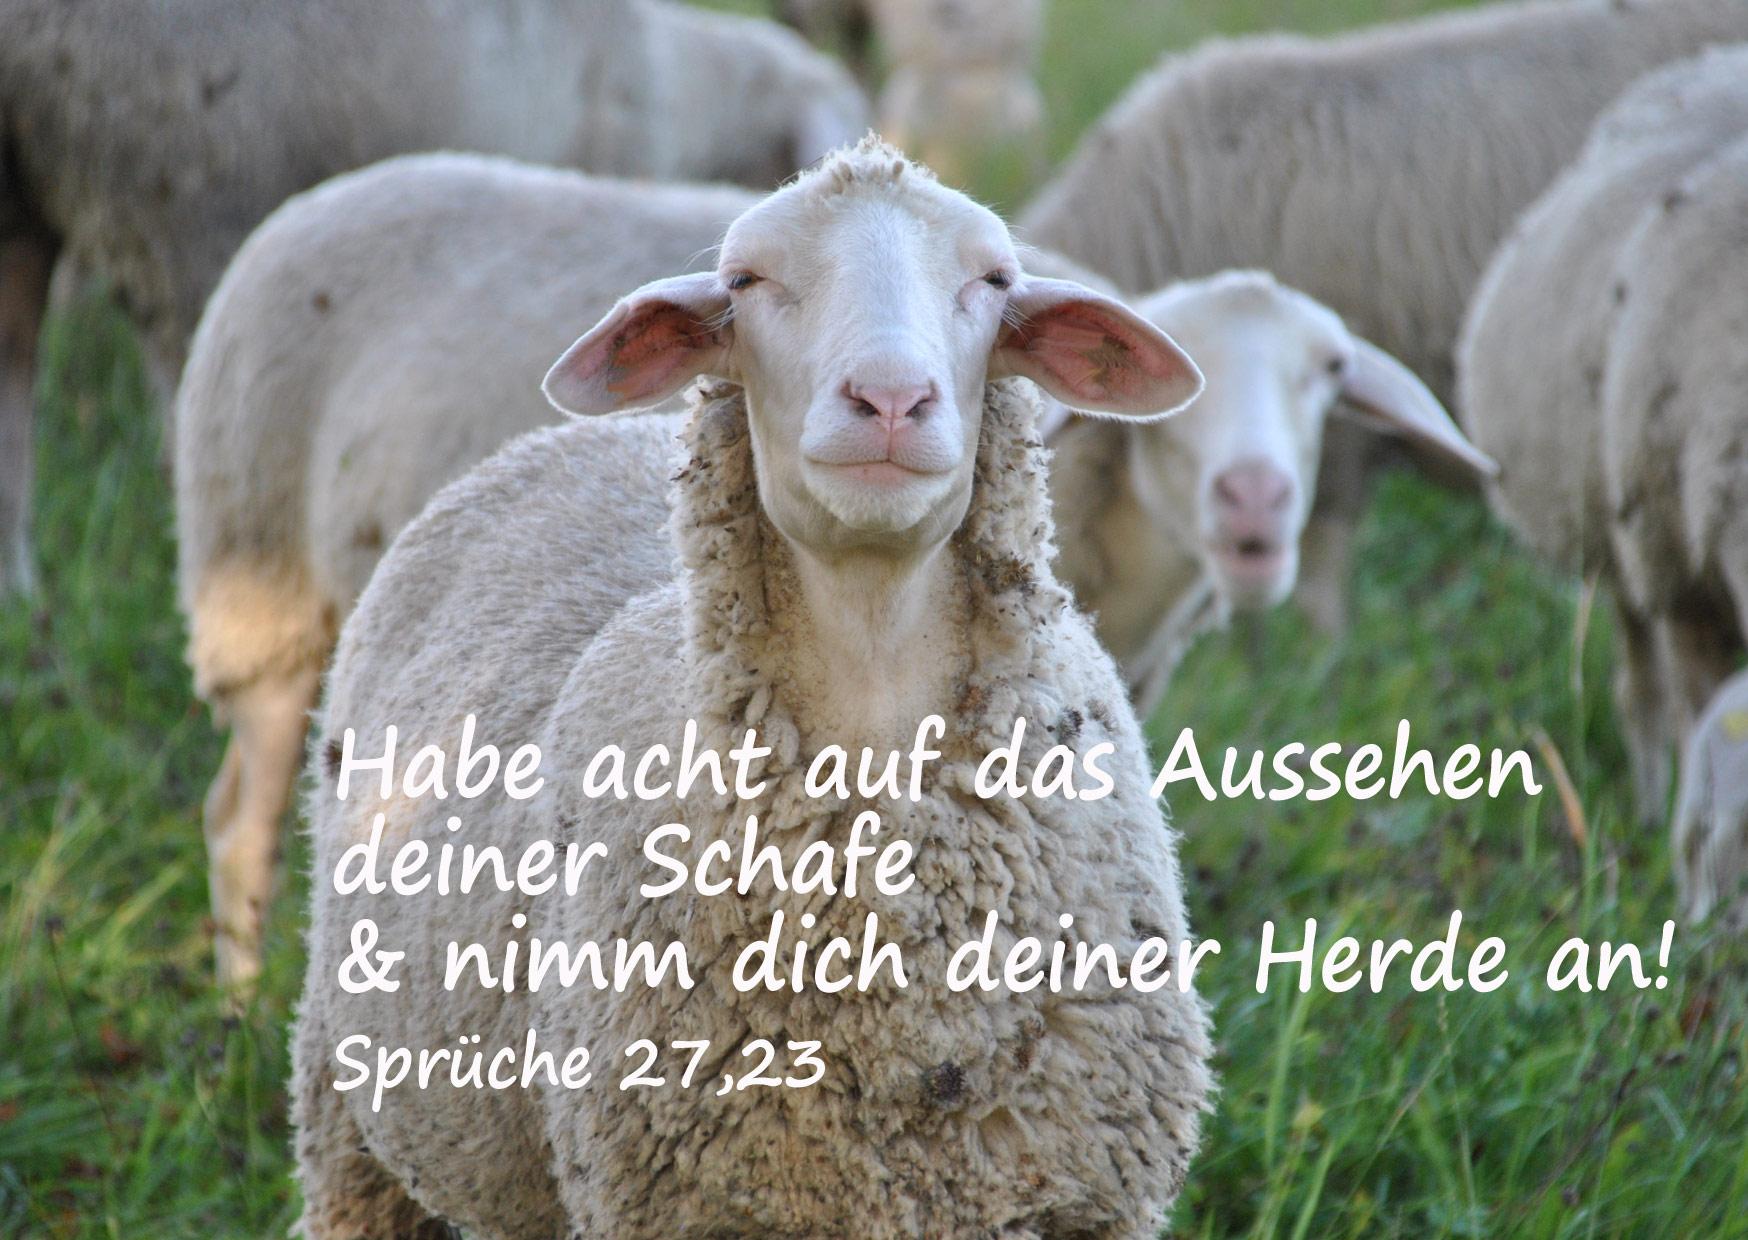 Bibelzitat, Sprüche 27,23, Schaf, Foto: Danzer, Chrstine, go 4 Jesus, Bibel